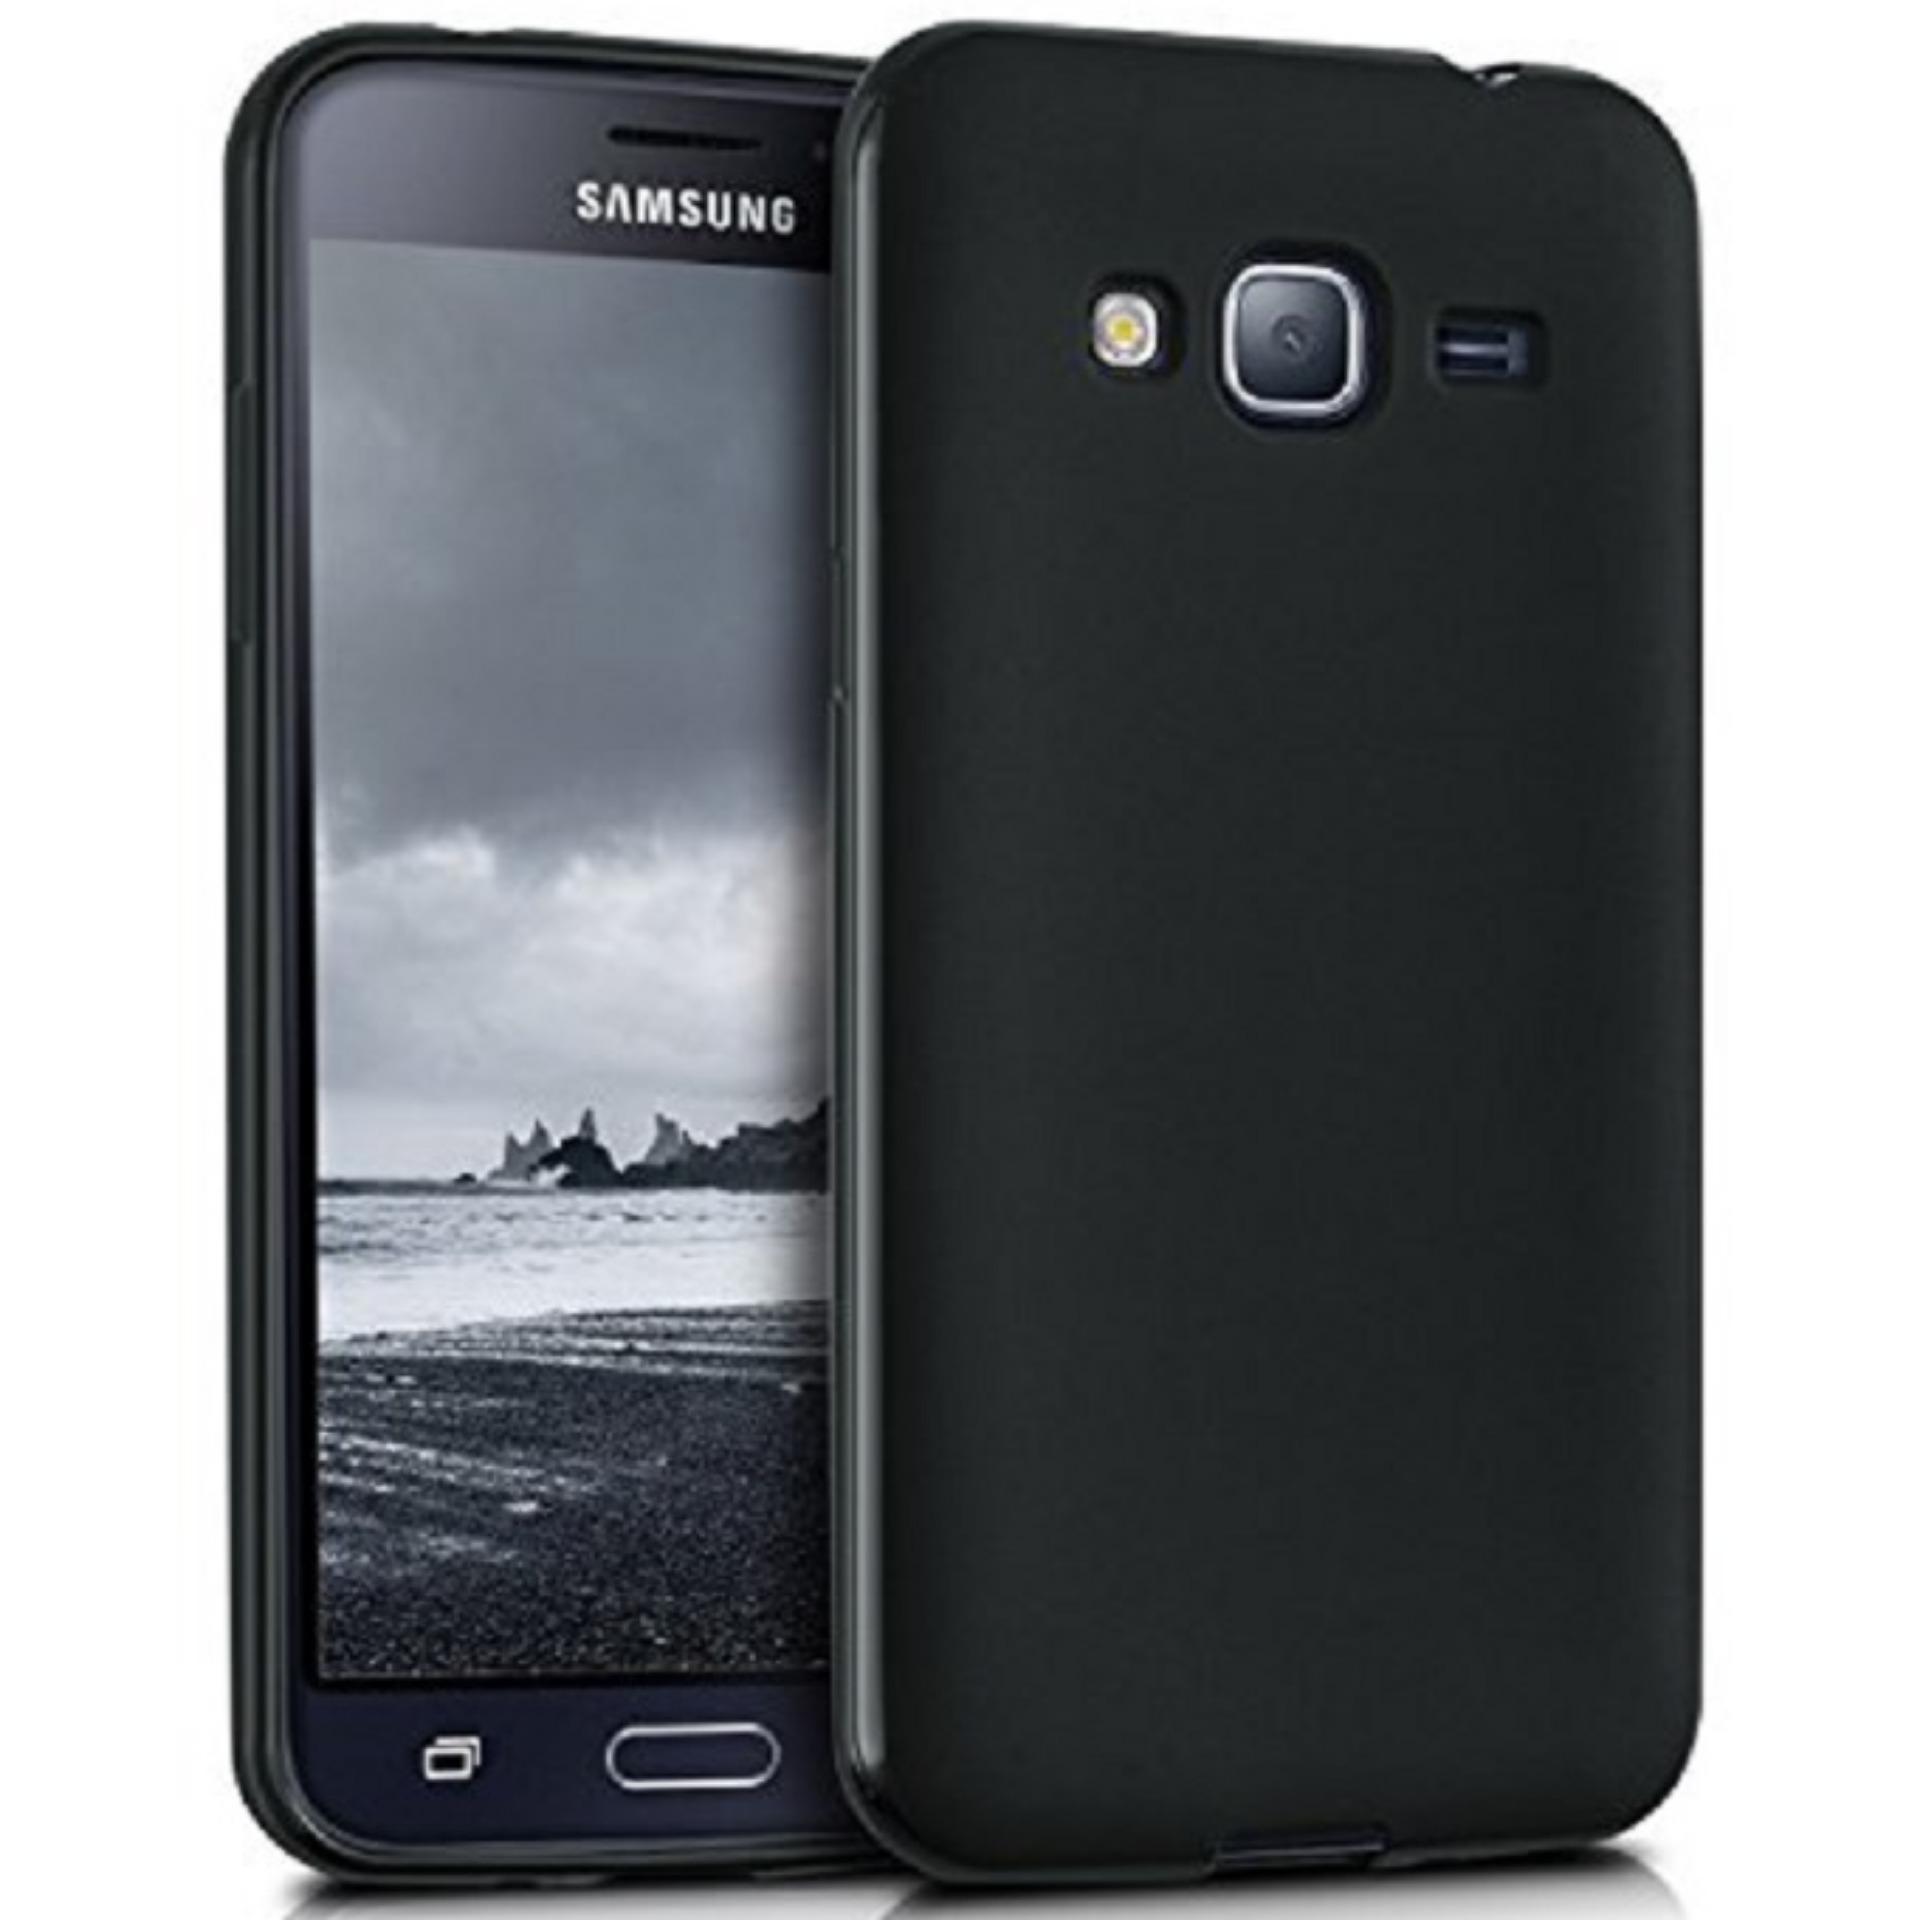 DarkNight for Samsung Galaxy J3 (Lama/Pertama) / J300 / J310 / J320 / 4G LTE / Duos| Slim Case Black Matte Softcase Premium (Anti Minyak/Anti Sidik Jari) - Hitam Doff